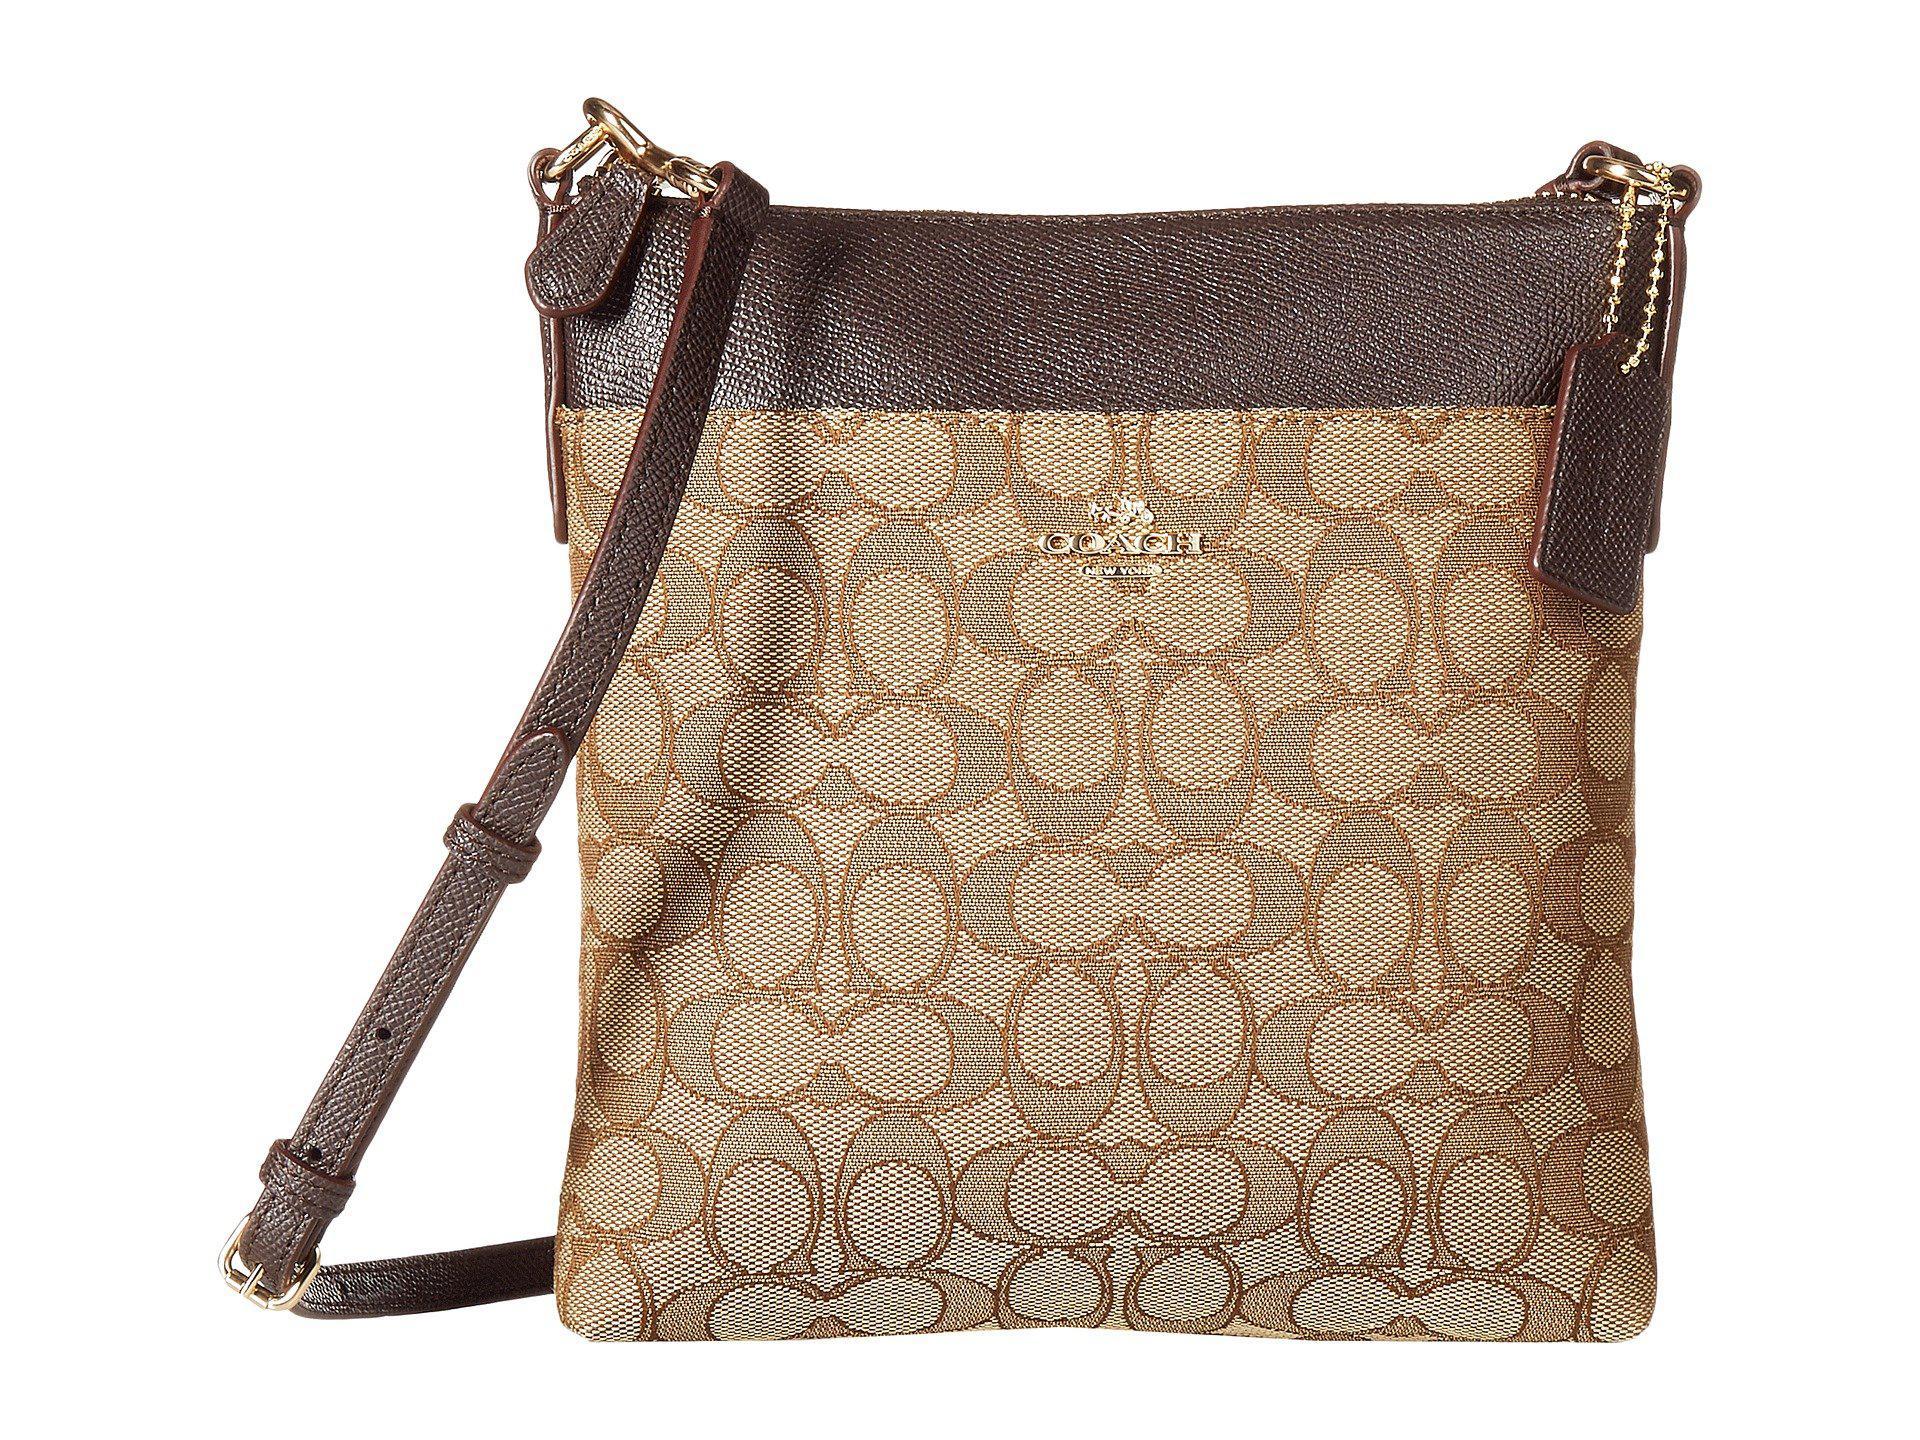 ceca276829 COACH. Women s Signature Messenger Crossbody (light khaki brown) Cross Body  Handbags